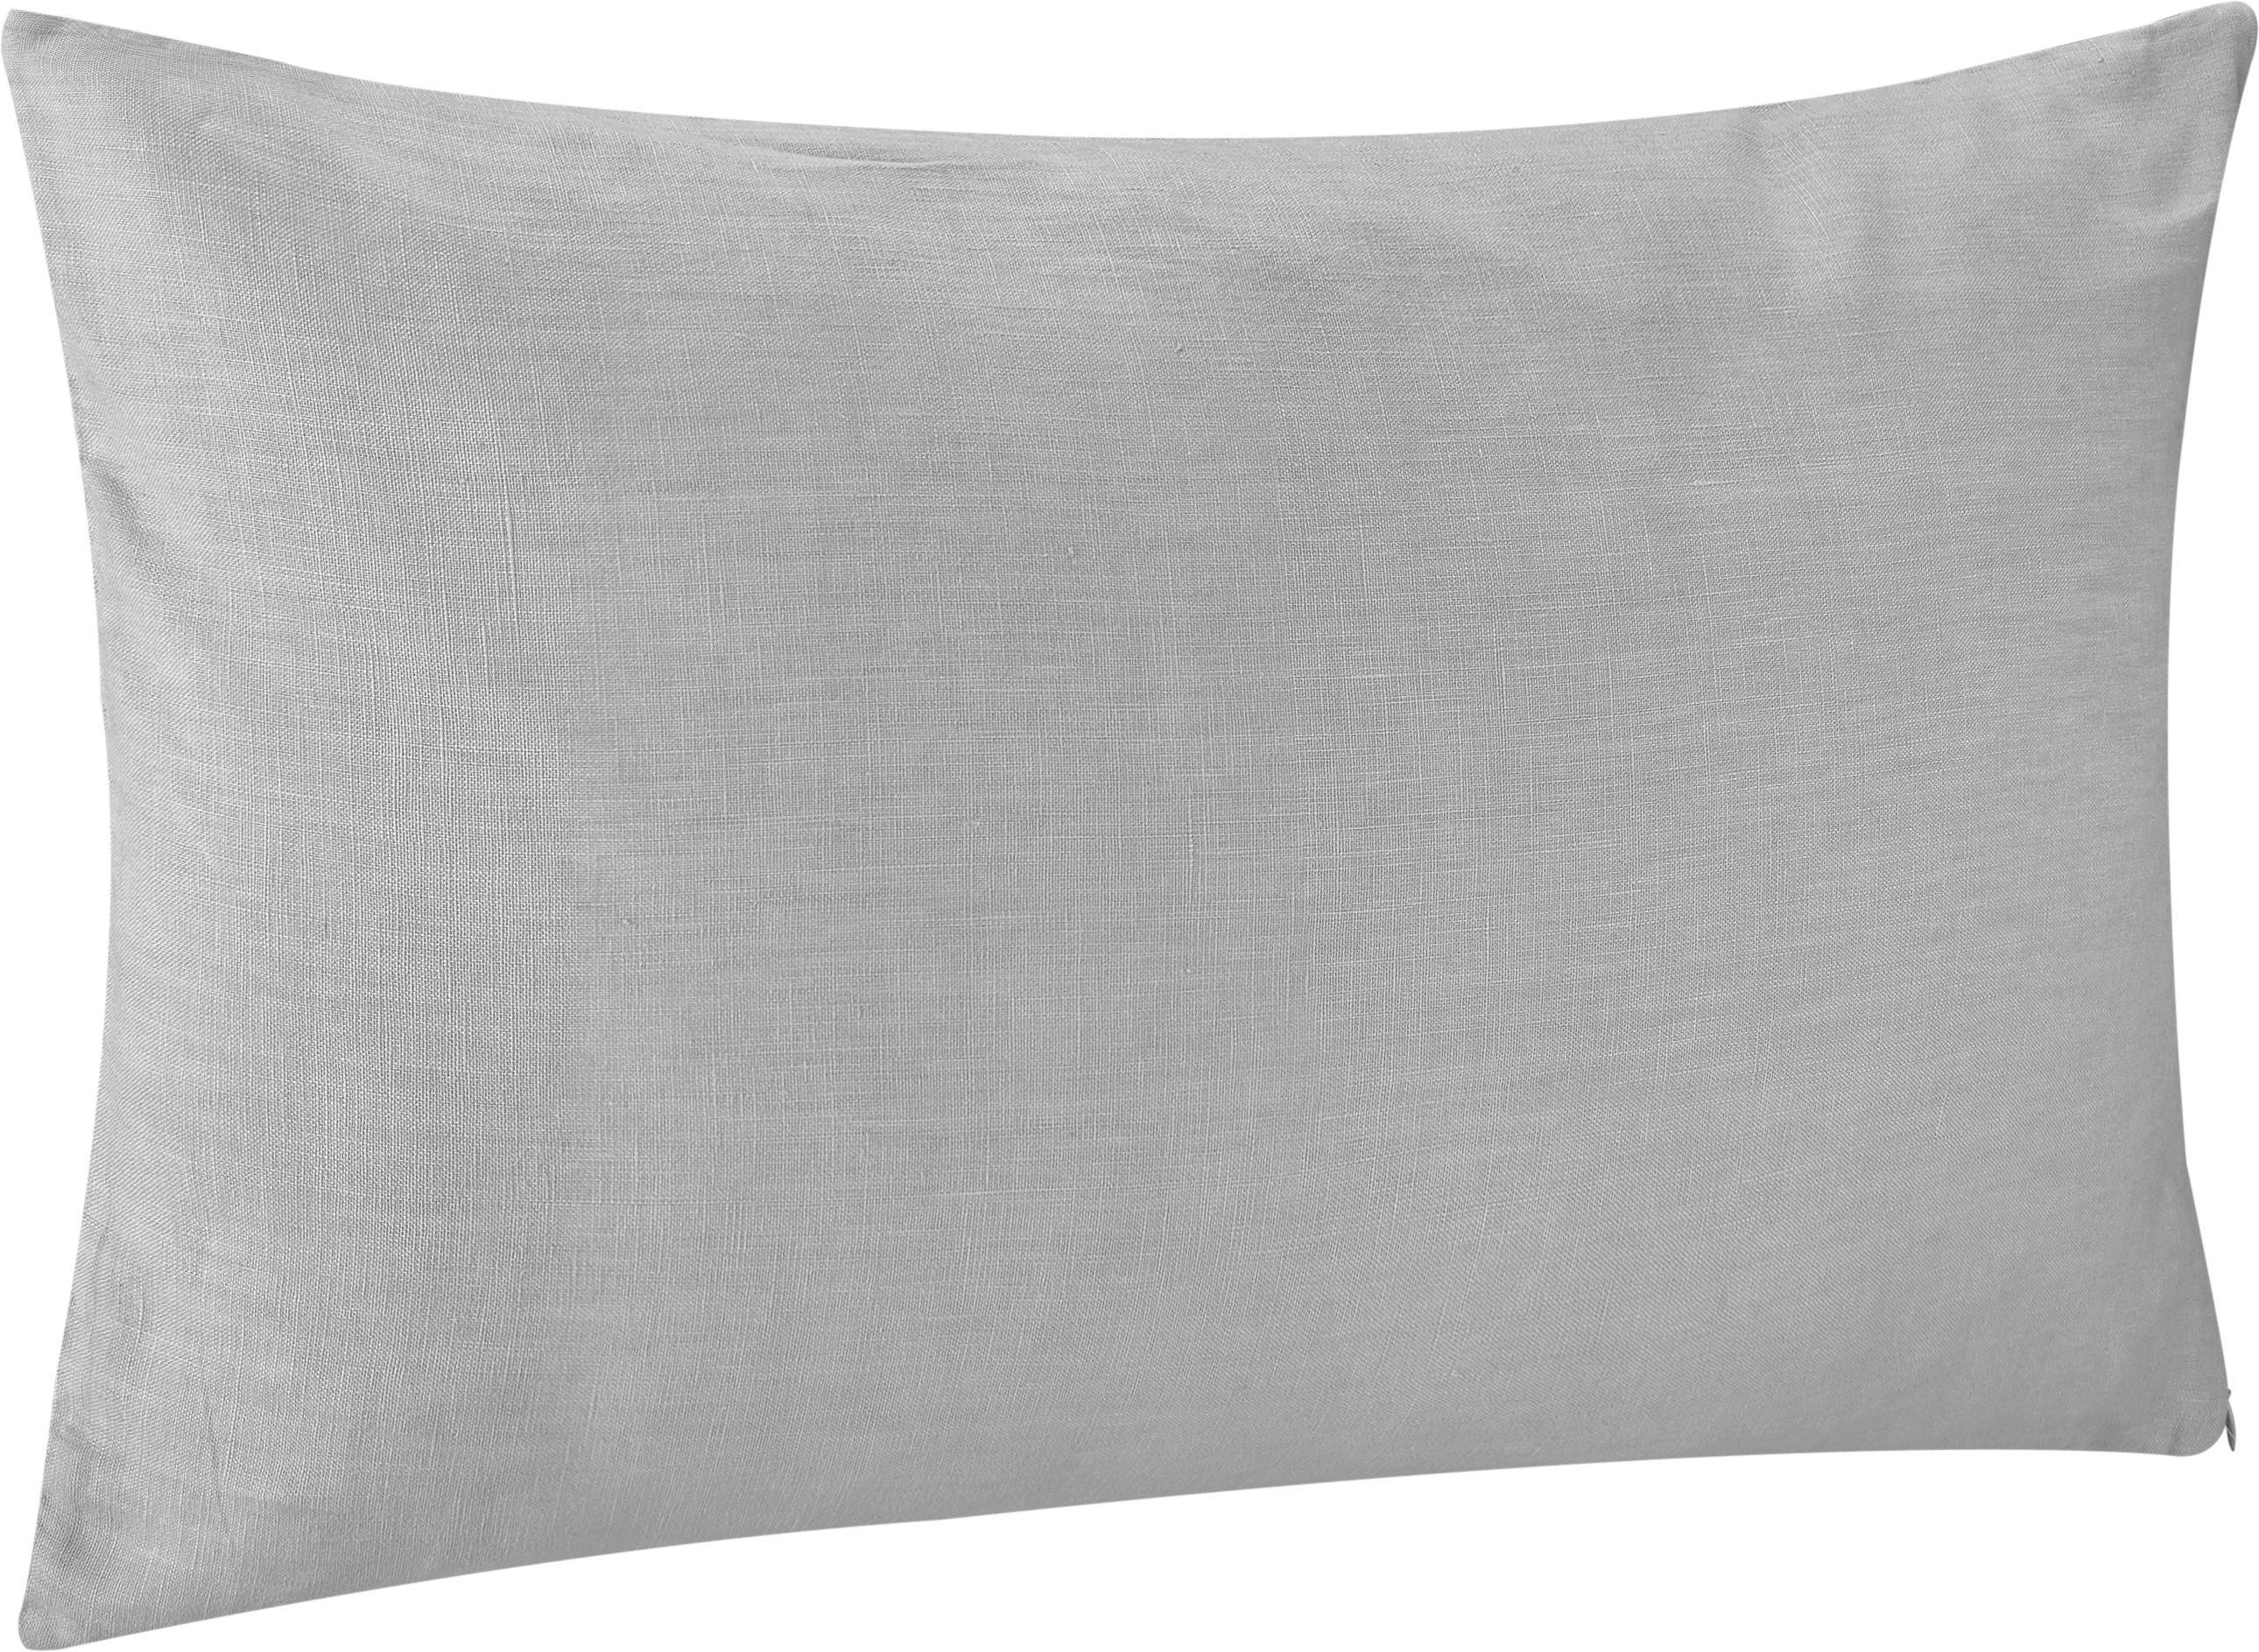 Zierkissen Melinda 40x60cm - Grau, ROMANTIK / LANDHAUS, Textil (40/60cm) - MÖMAX modern living